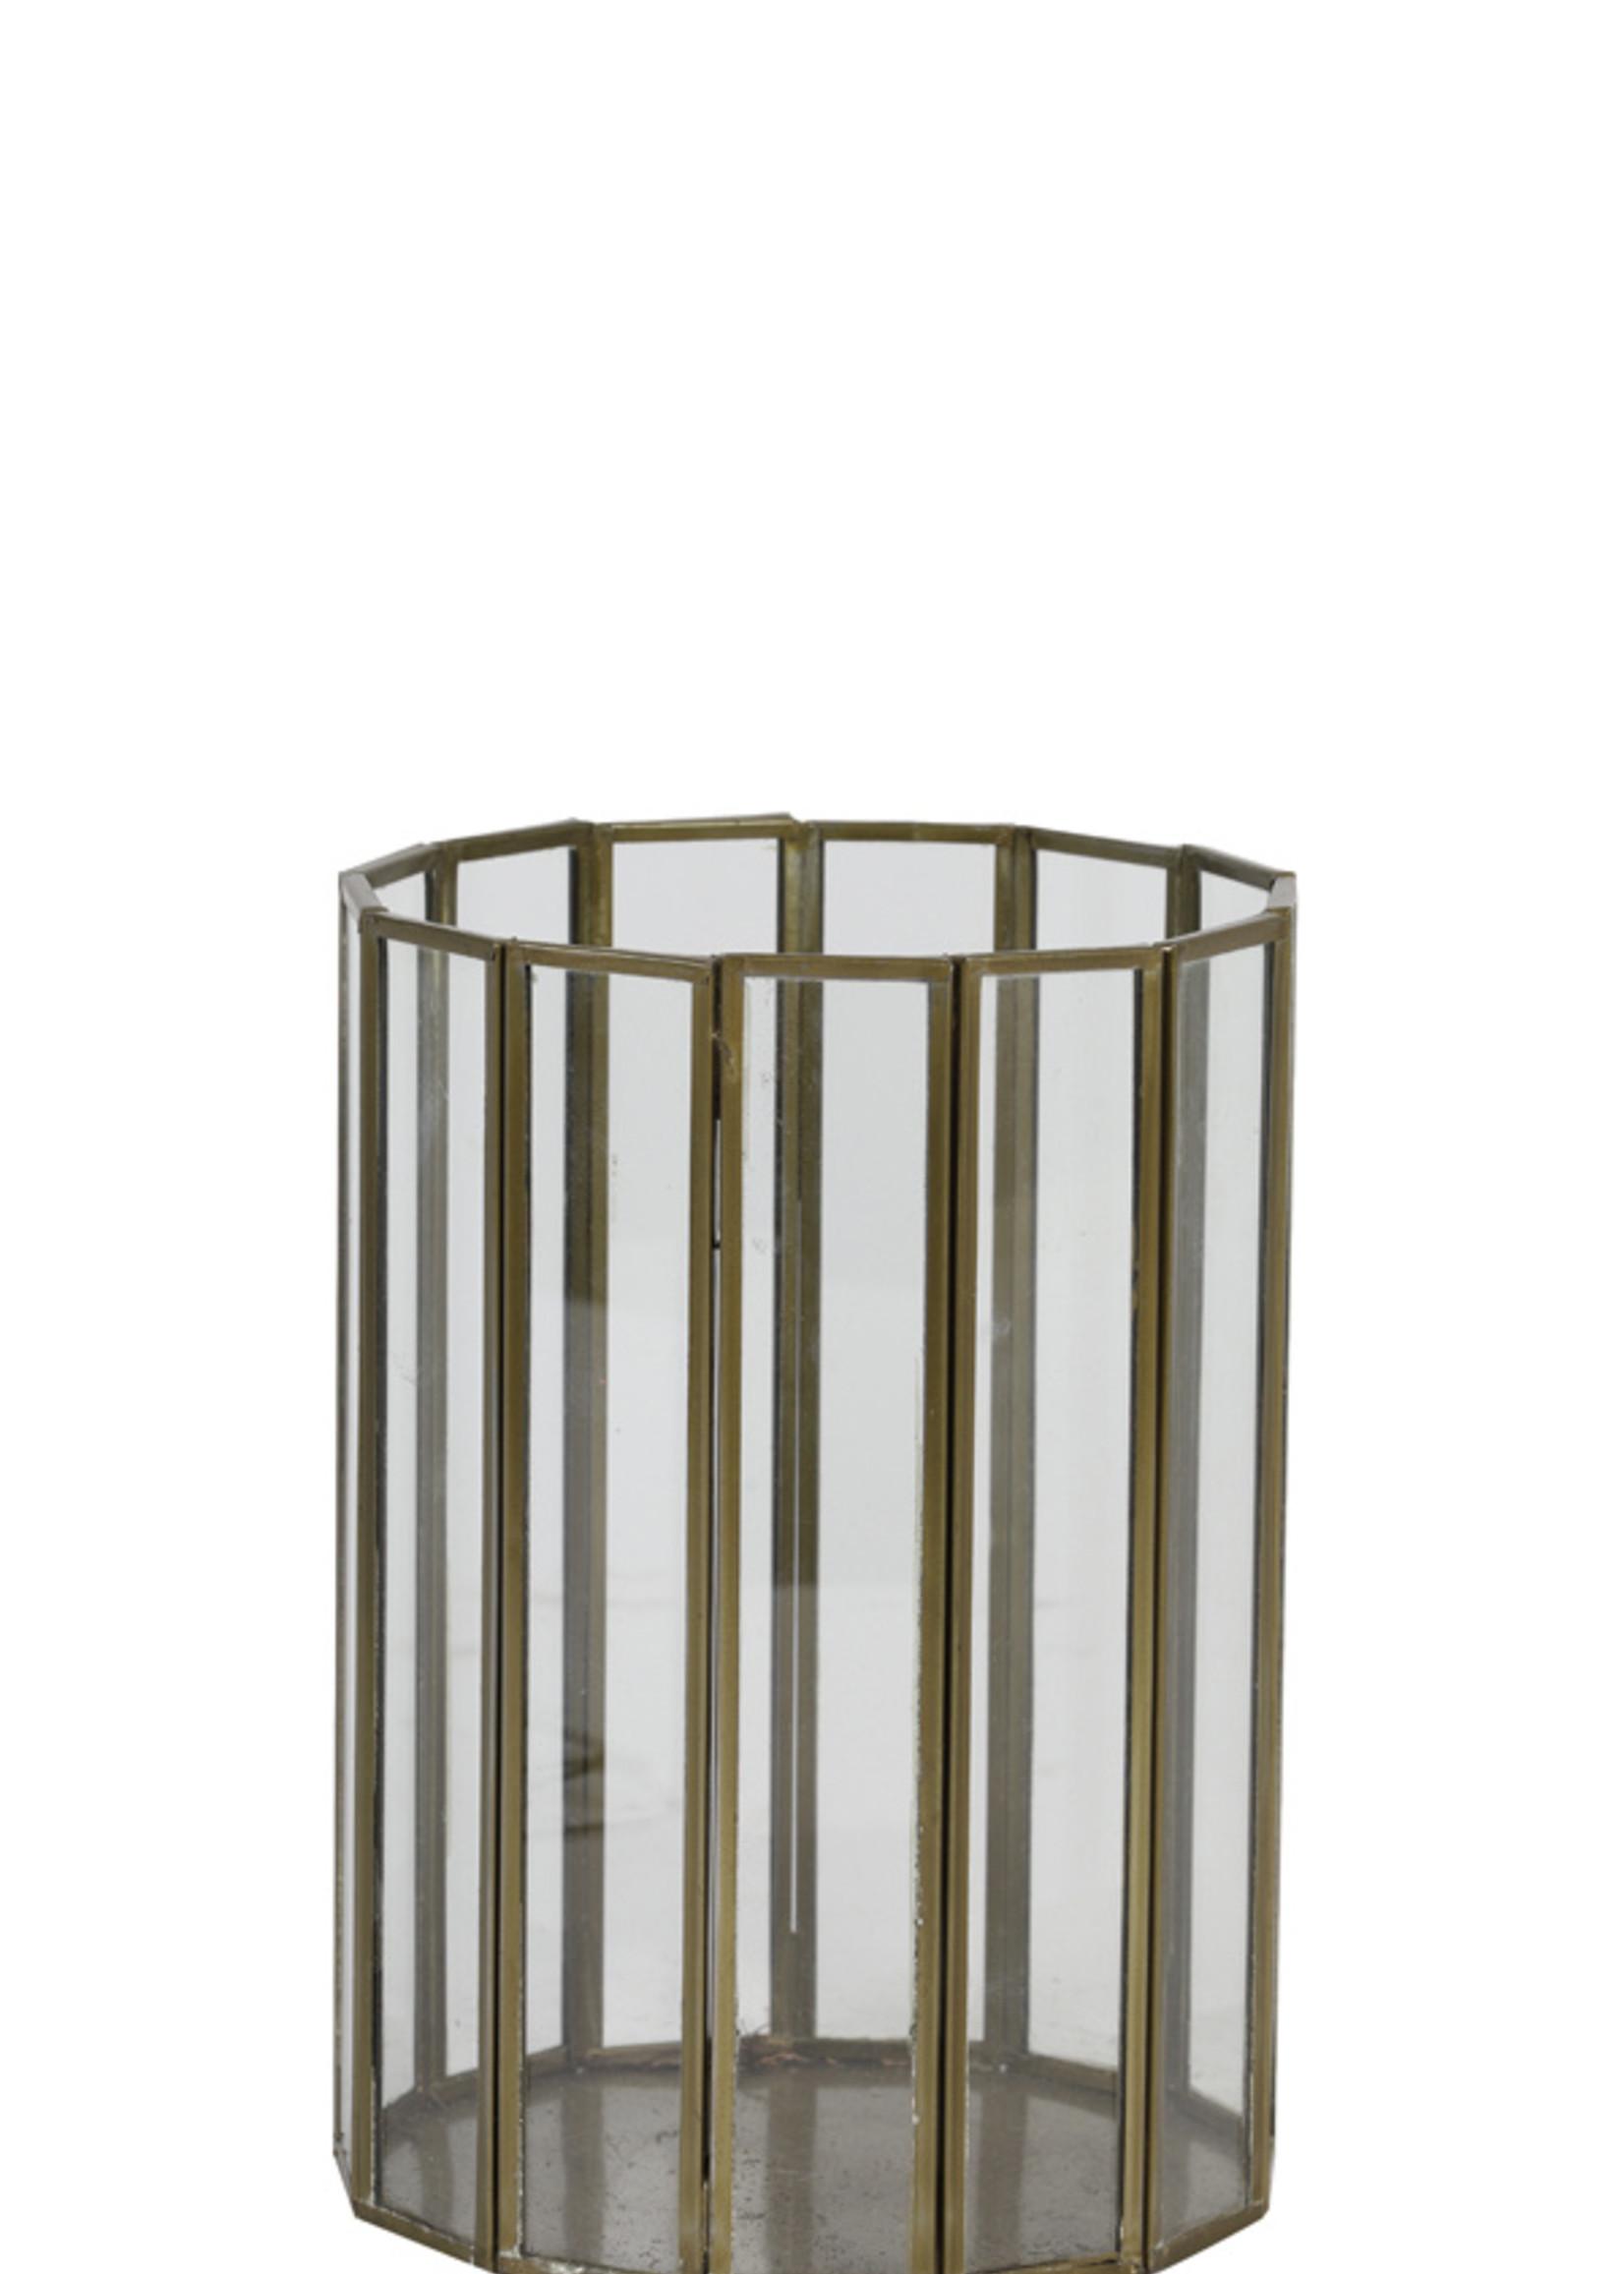 Light & Living Theelicht 14x20cm Uldun glas antiek goud